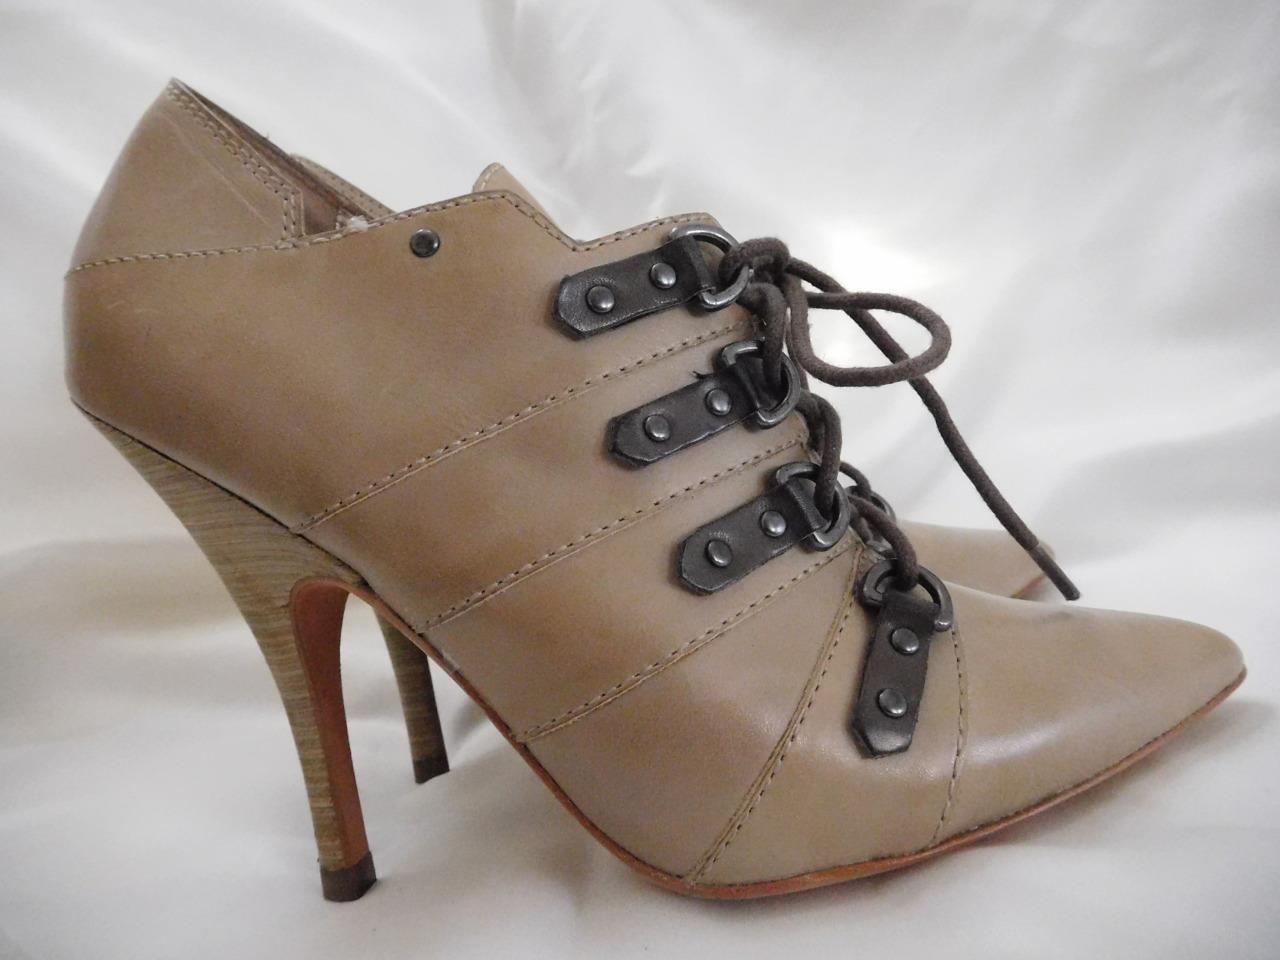 Jean-Michel Cazabat Ida High Heel Lace-Up Booties 37.5 NWOB